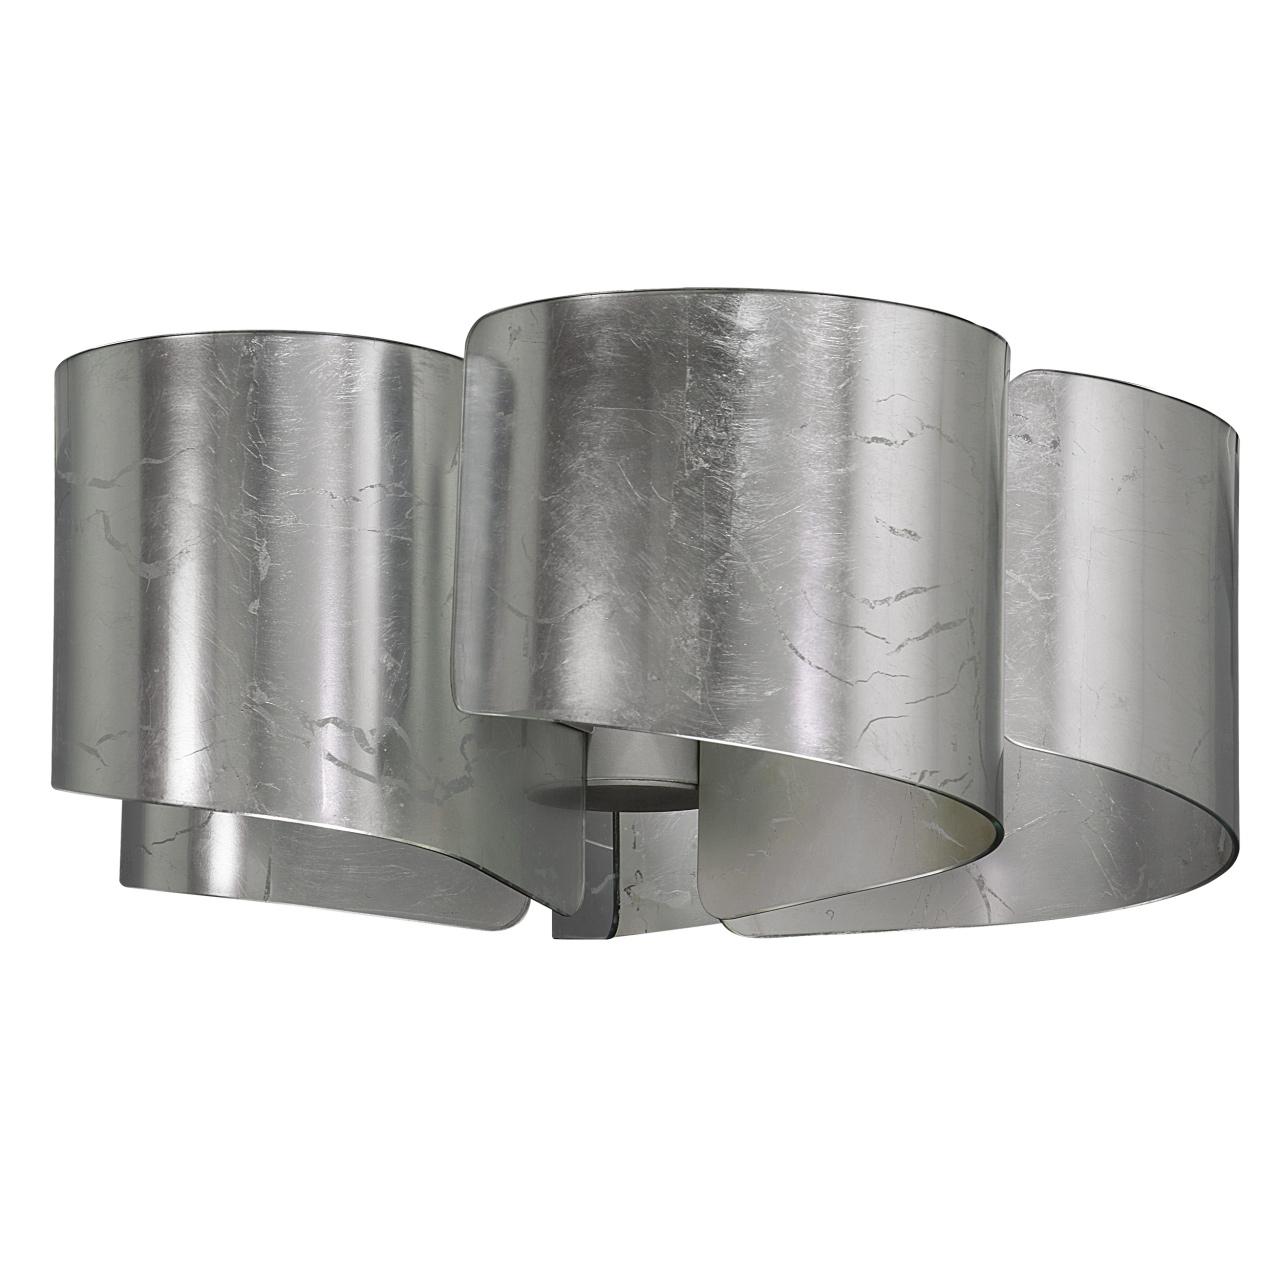 Люстра потолочная Pittore 5х40W E27 silver Lightstar 811054